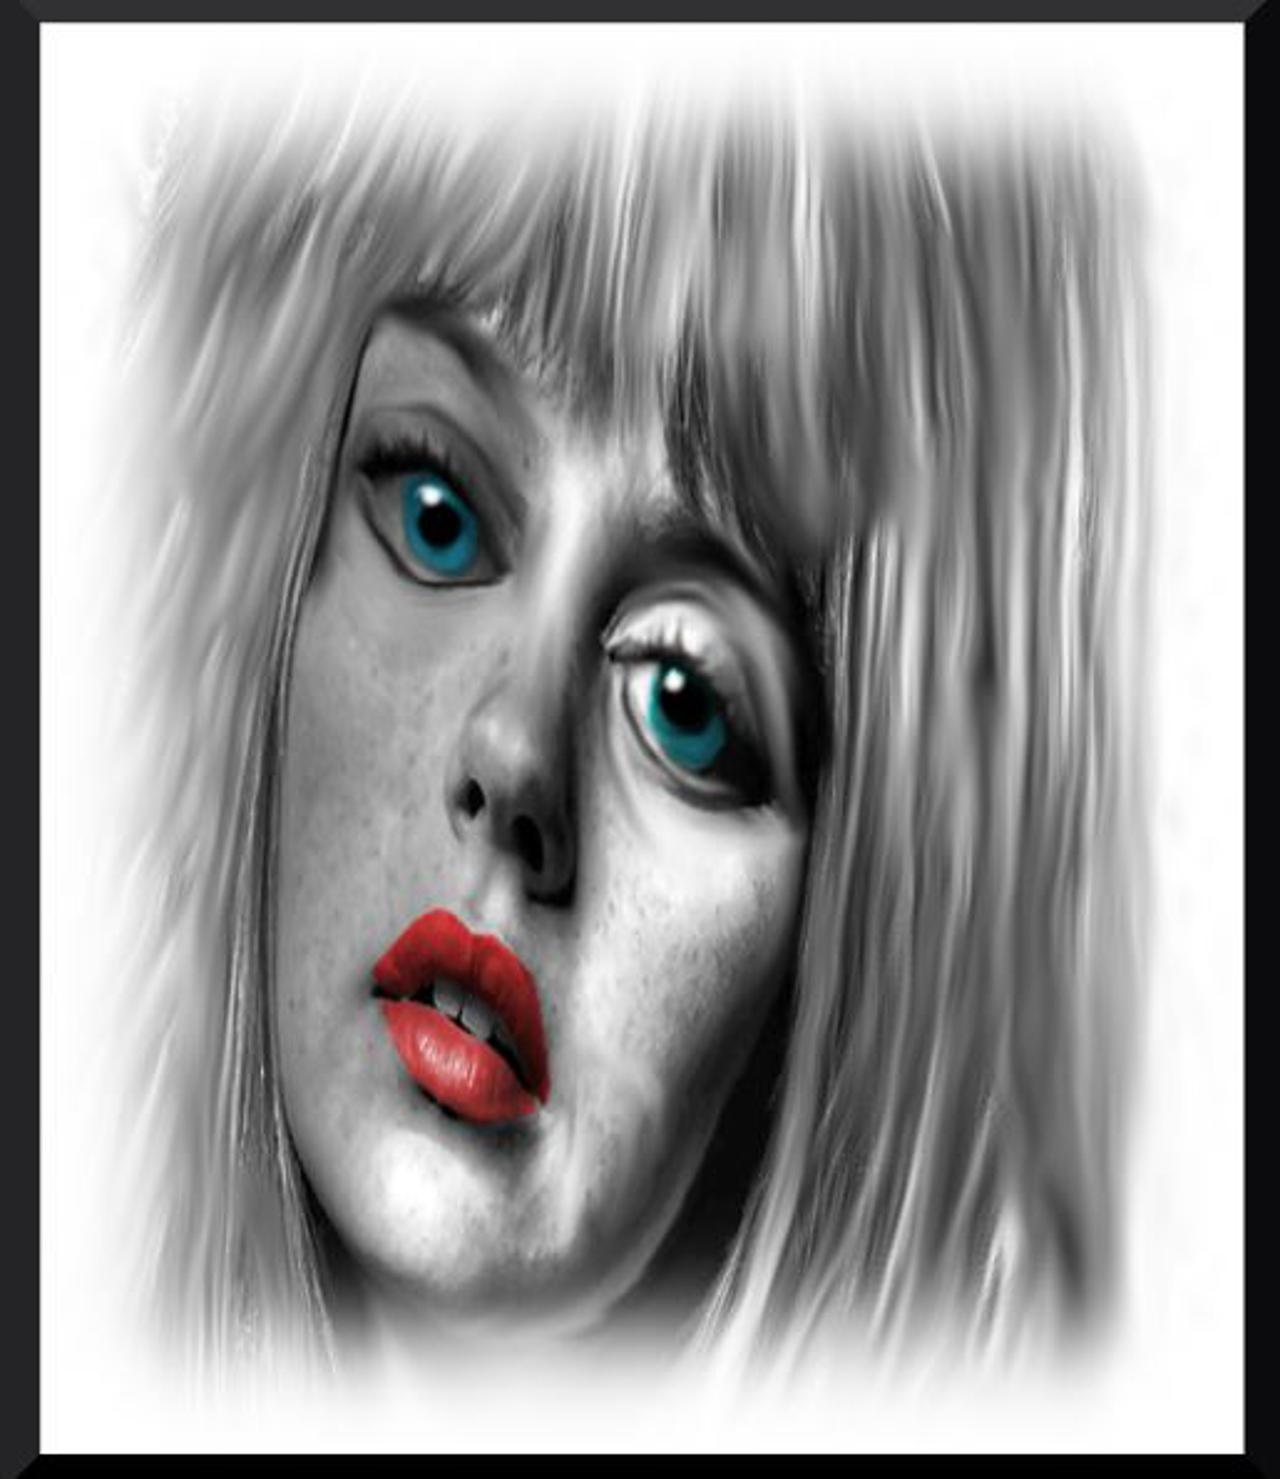 Blue eyes by mikestevenson1955